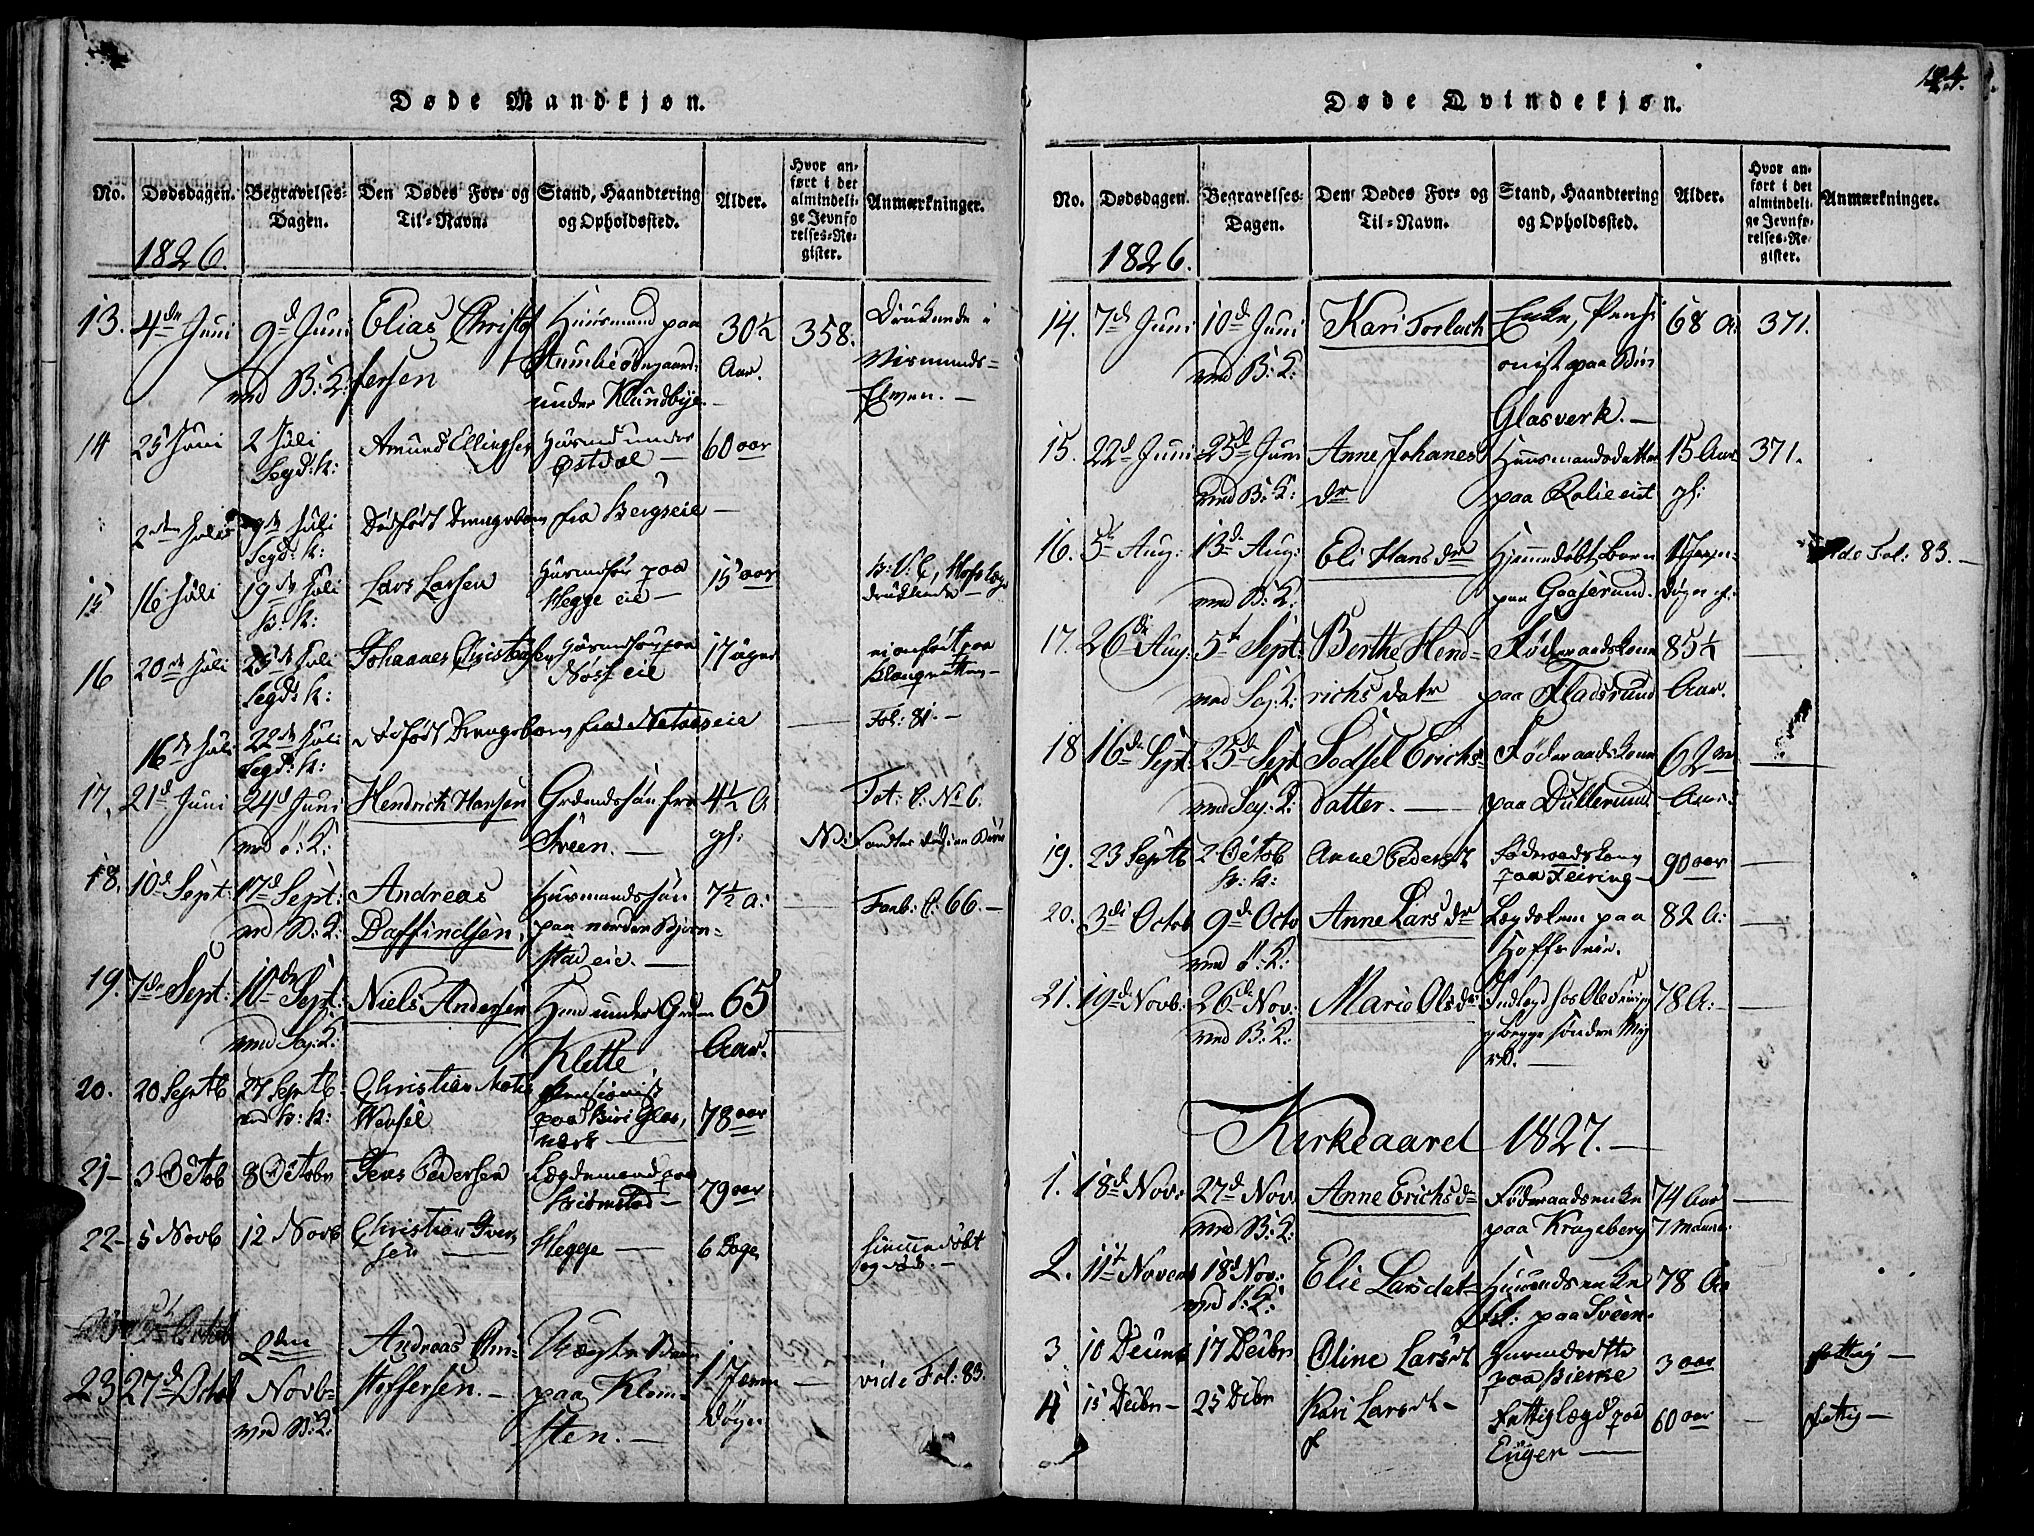 SAH, Biri prestekontor, Ministerialbok nr. 3, 1814-1828, s. 124